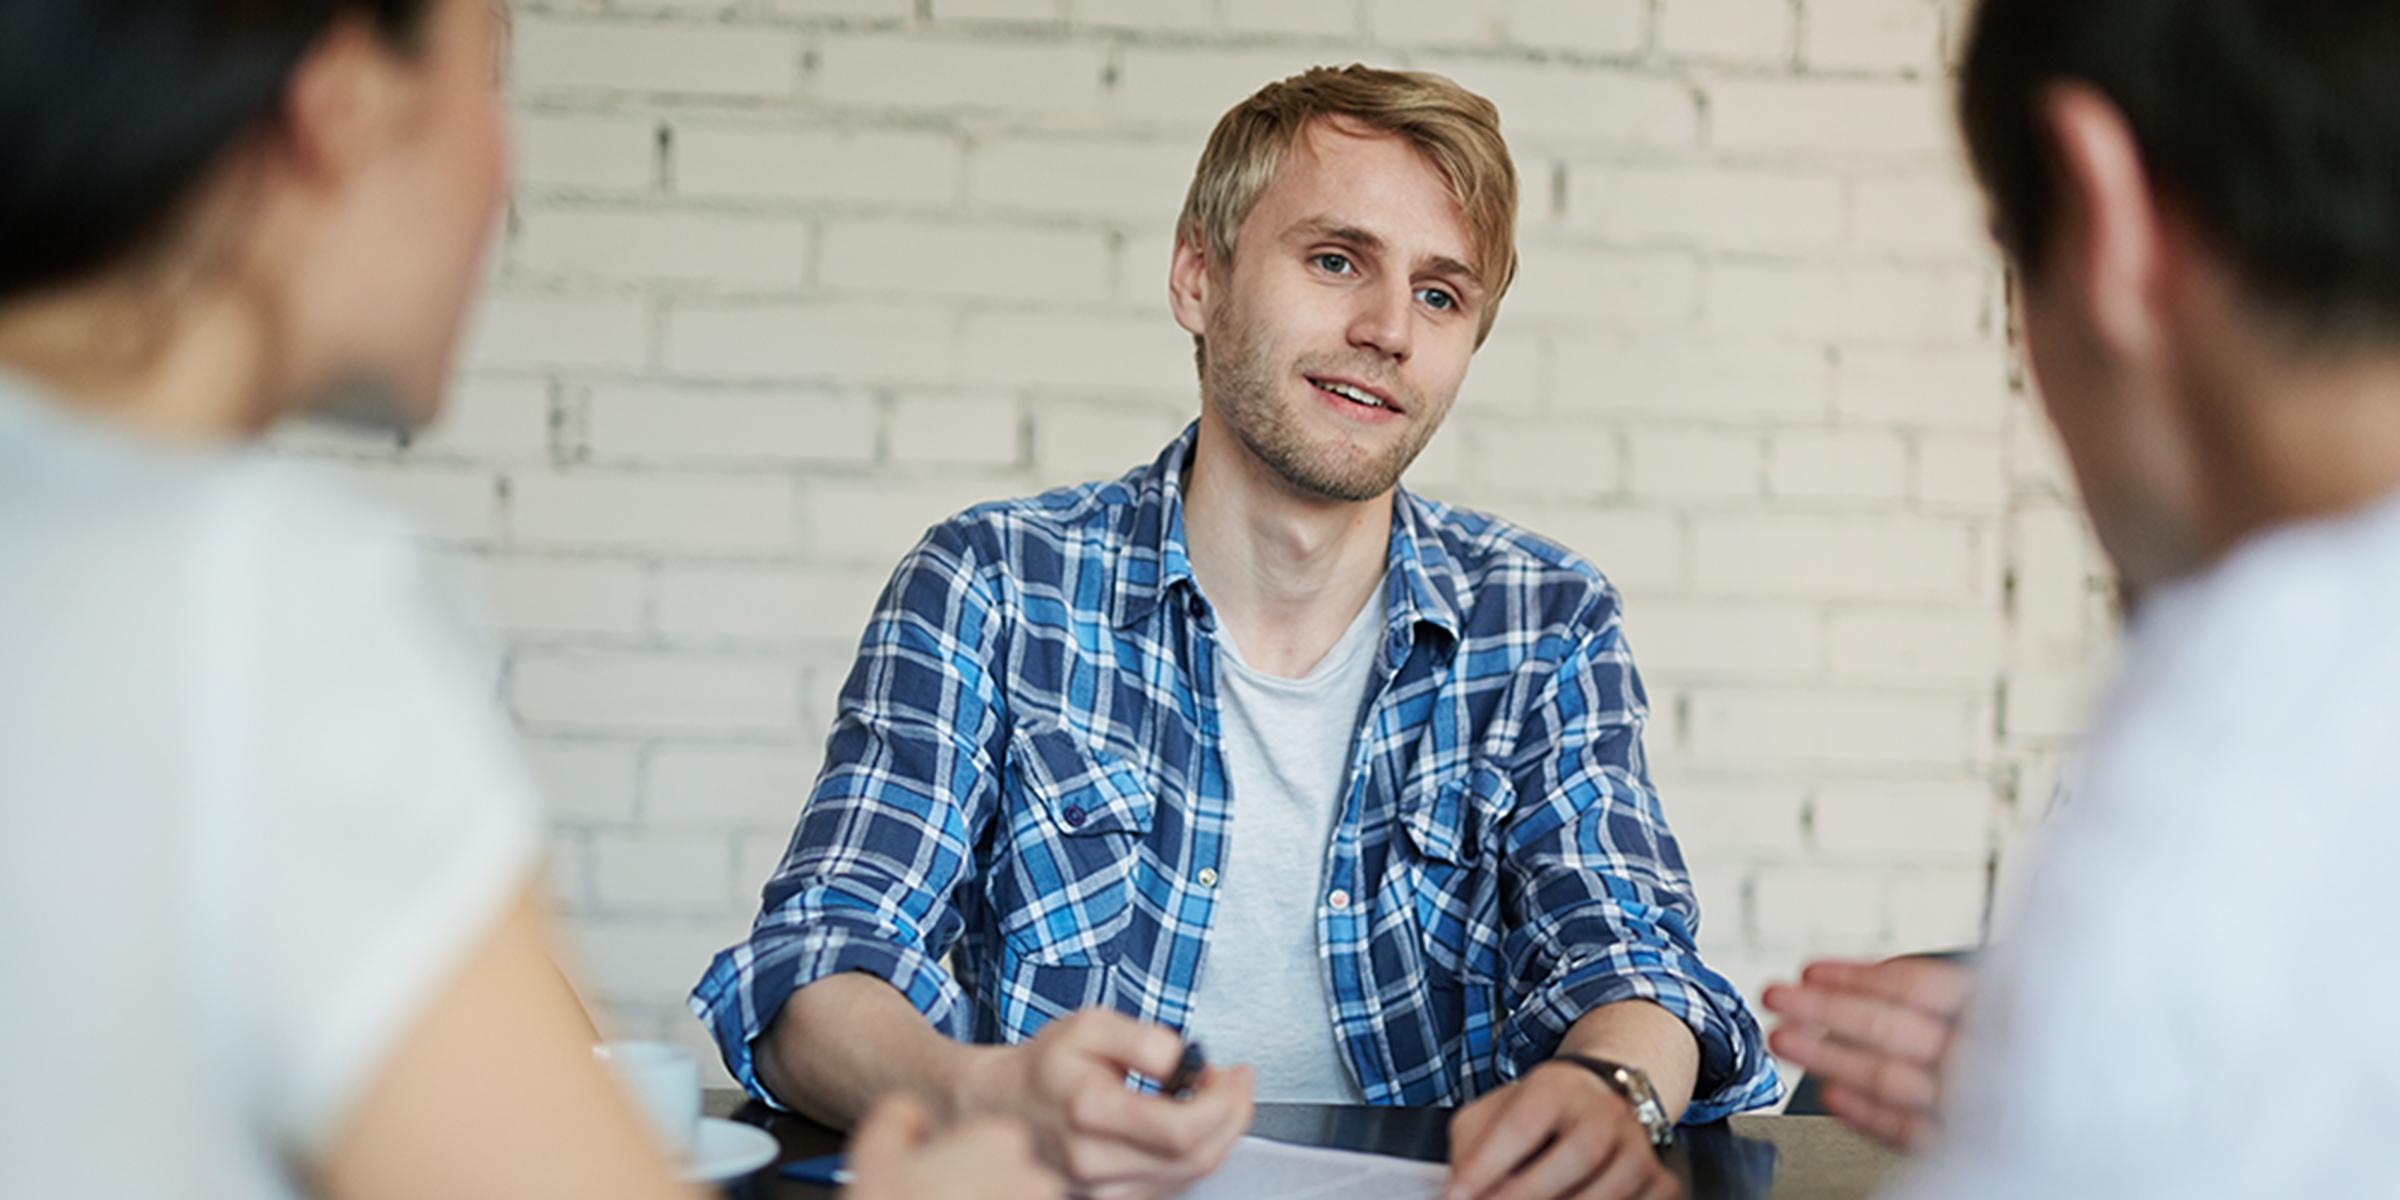 A young man at a job interview